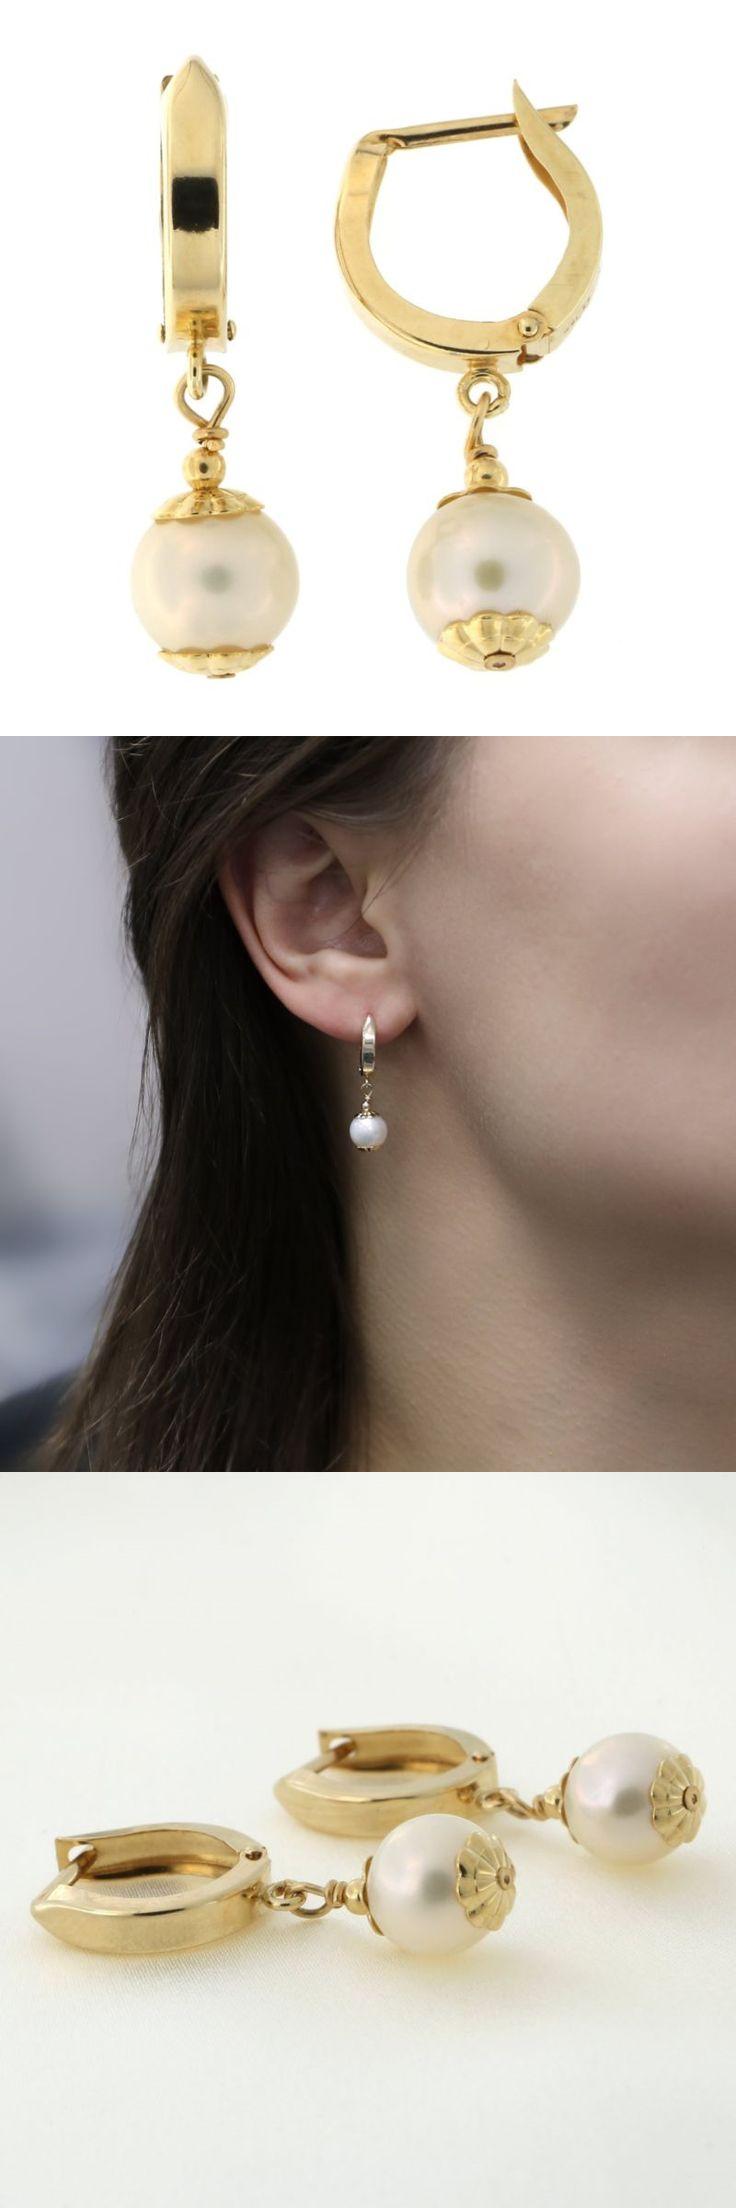 Pearl 10990: 14K Yellow Gold 7Mm Freshwater Cultured Pearl Huggie Dangle Earrings -> BUY IT NOW ONLY: $108 on eBay!